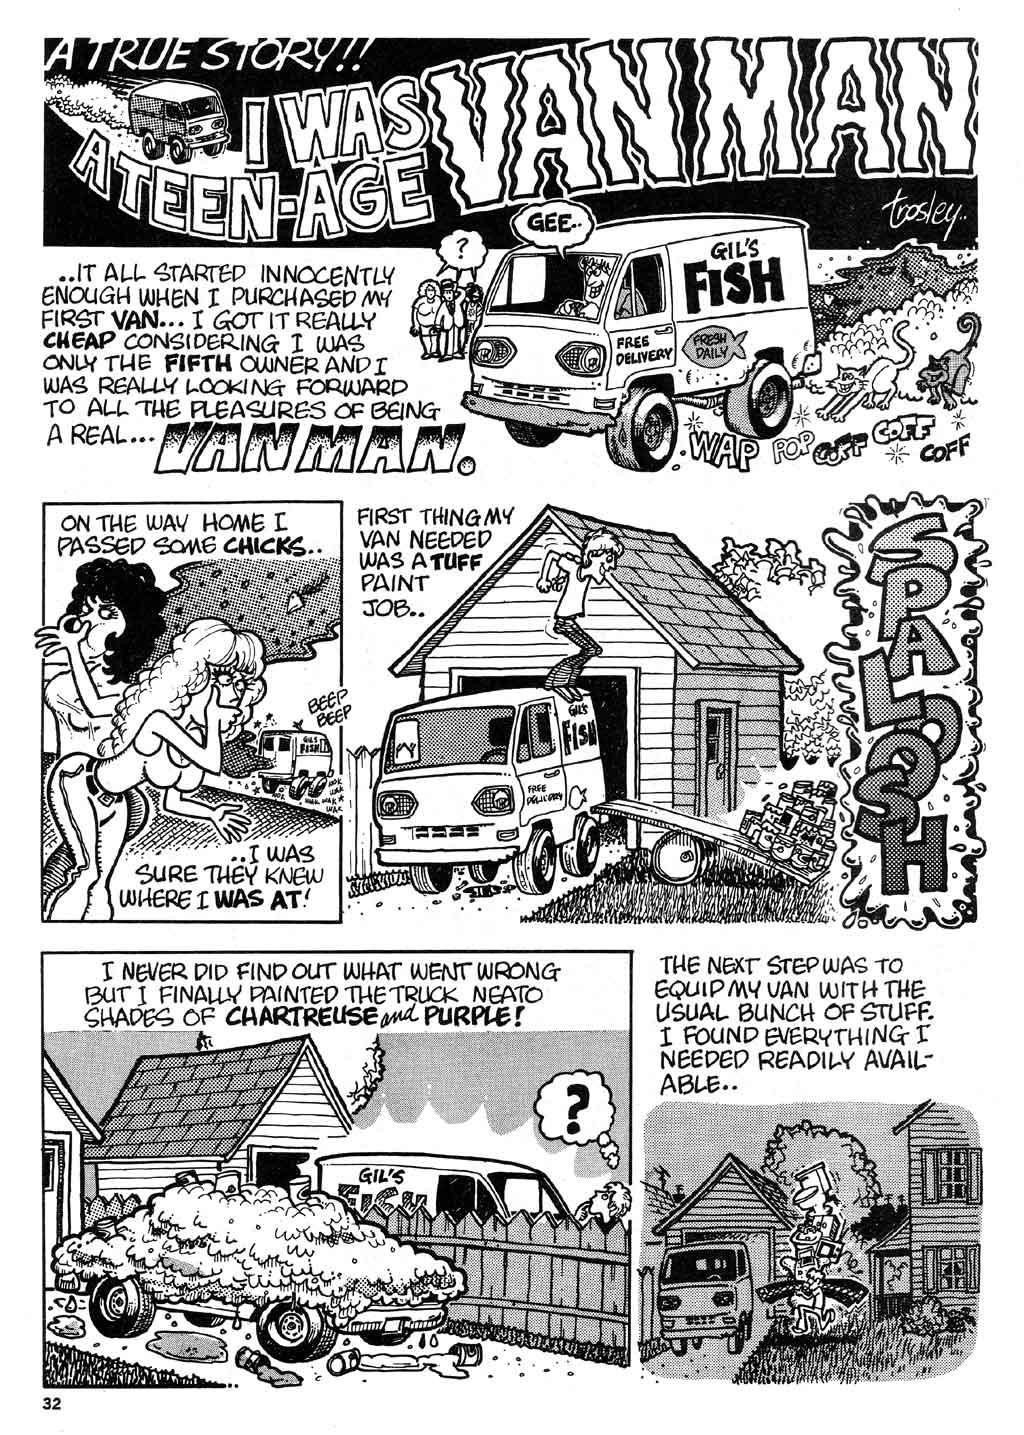 Hot Rod Cartoon 1973 Voitures anciennes-8483